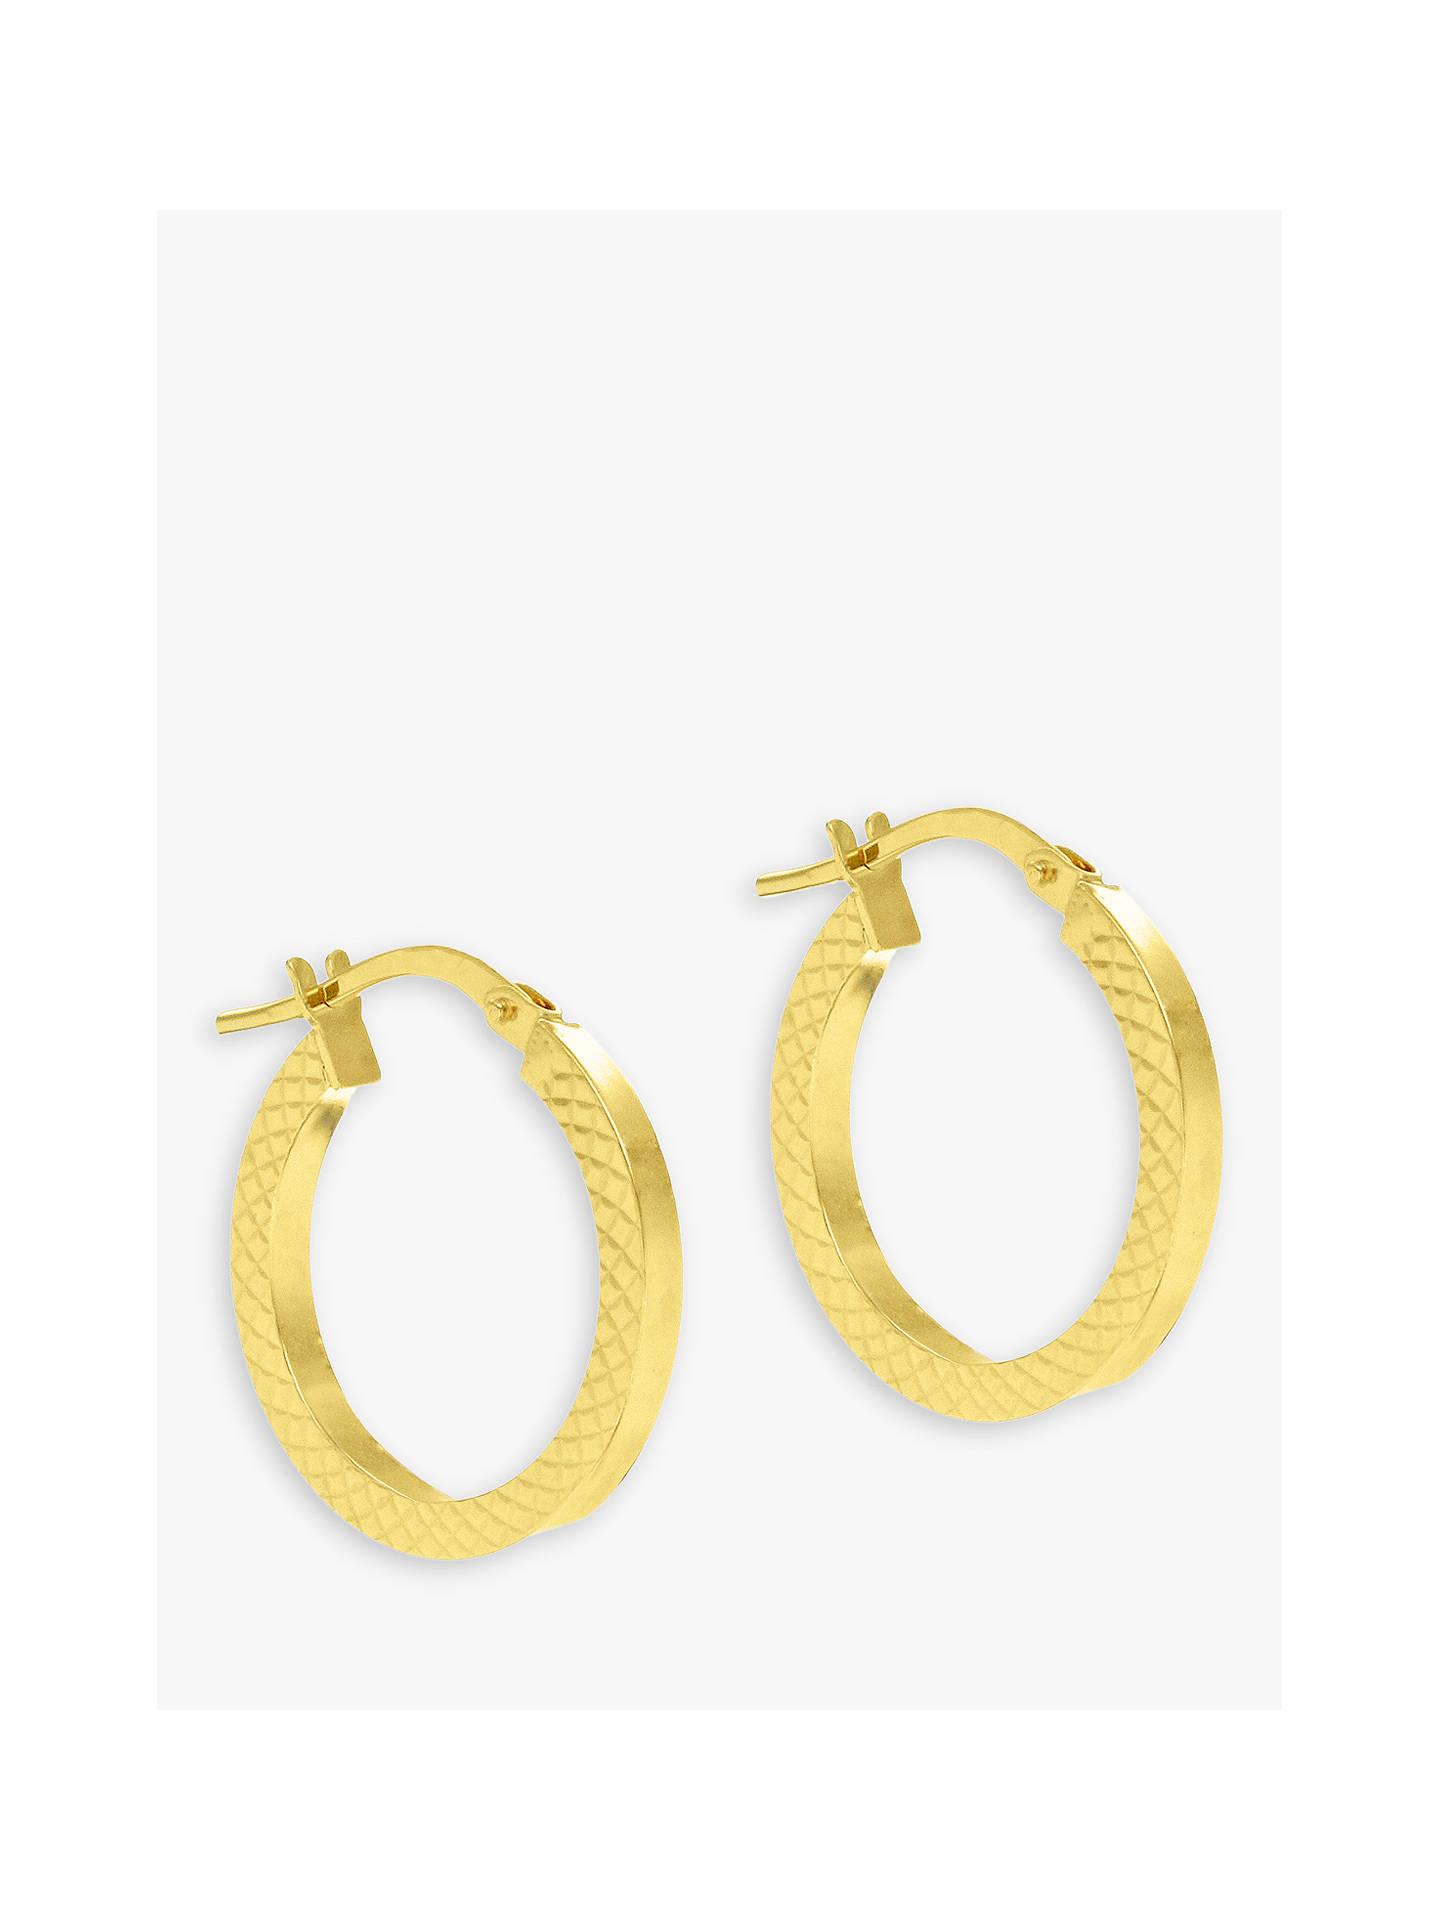 03605458b340f IBB 9ct Gold Cobra Hoop Earrings, Gold